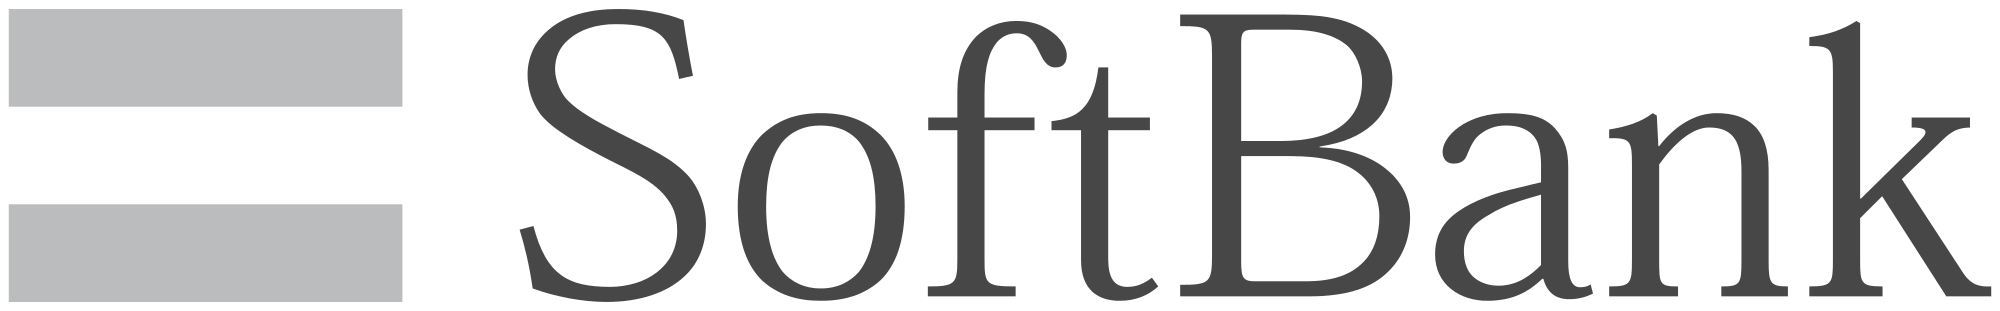 logo Softbank